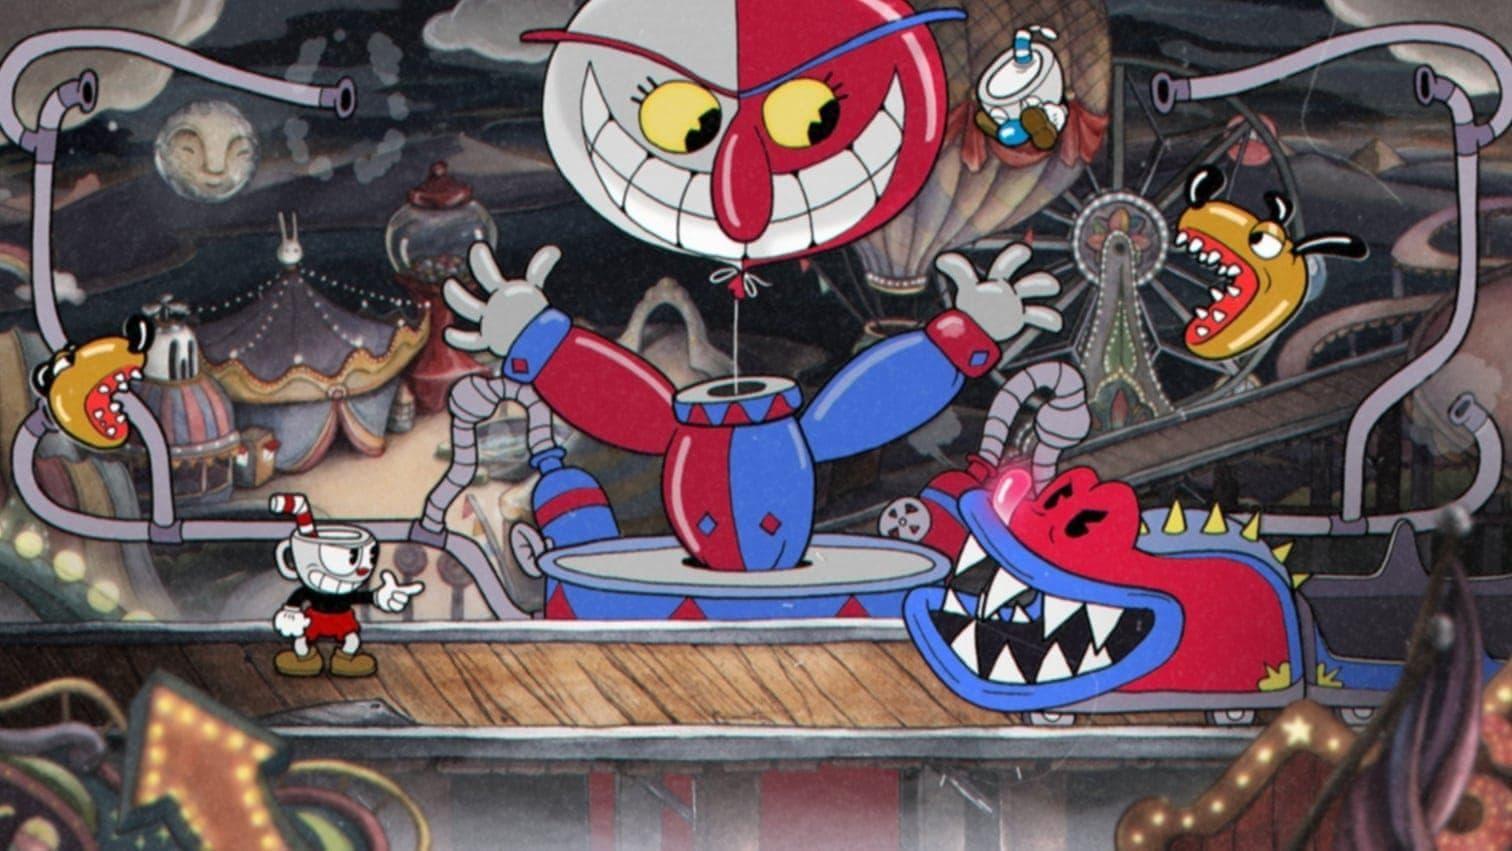 <p>Titel: OKAMI HD / 大神 絶景版<br />Genre: Abenteuer<br />Entwickler: CAPCOM Co.